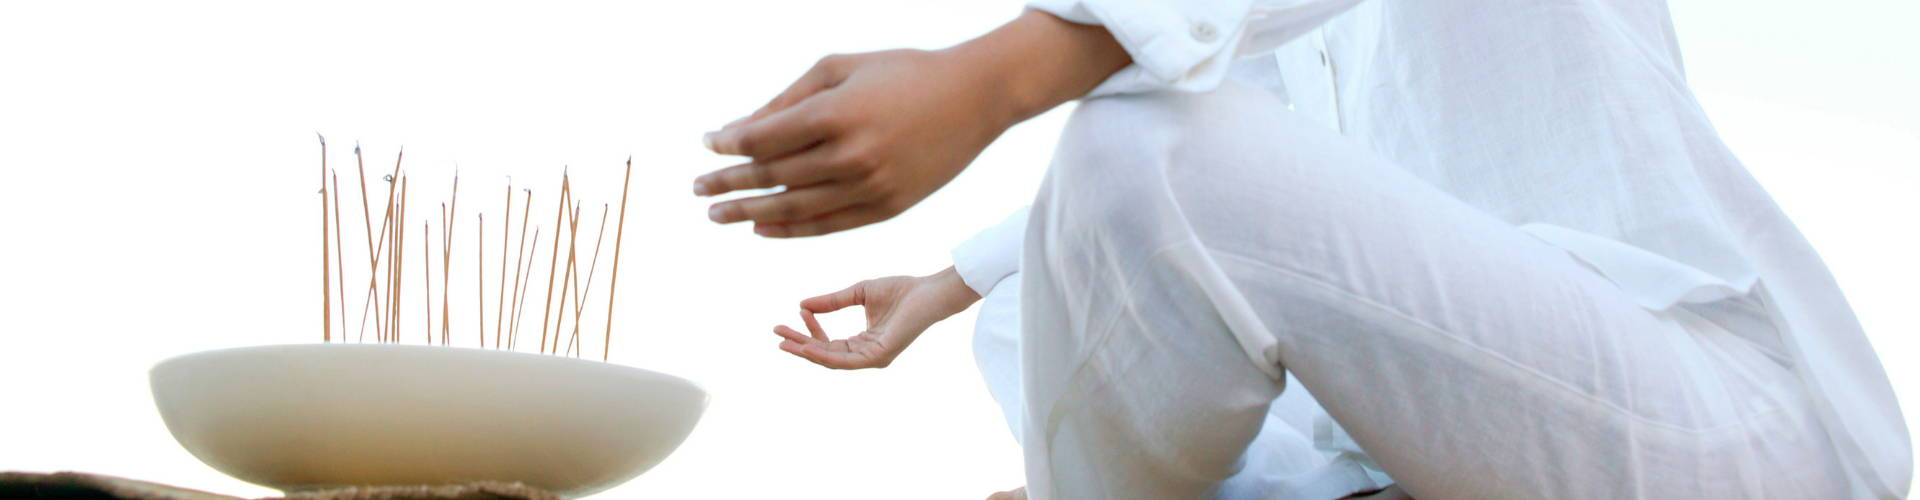 meditate incense